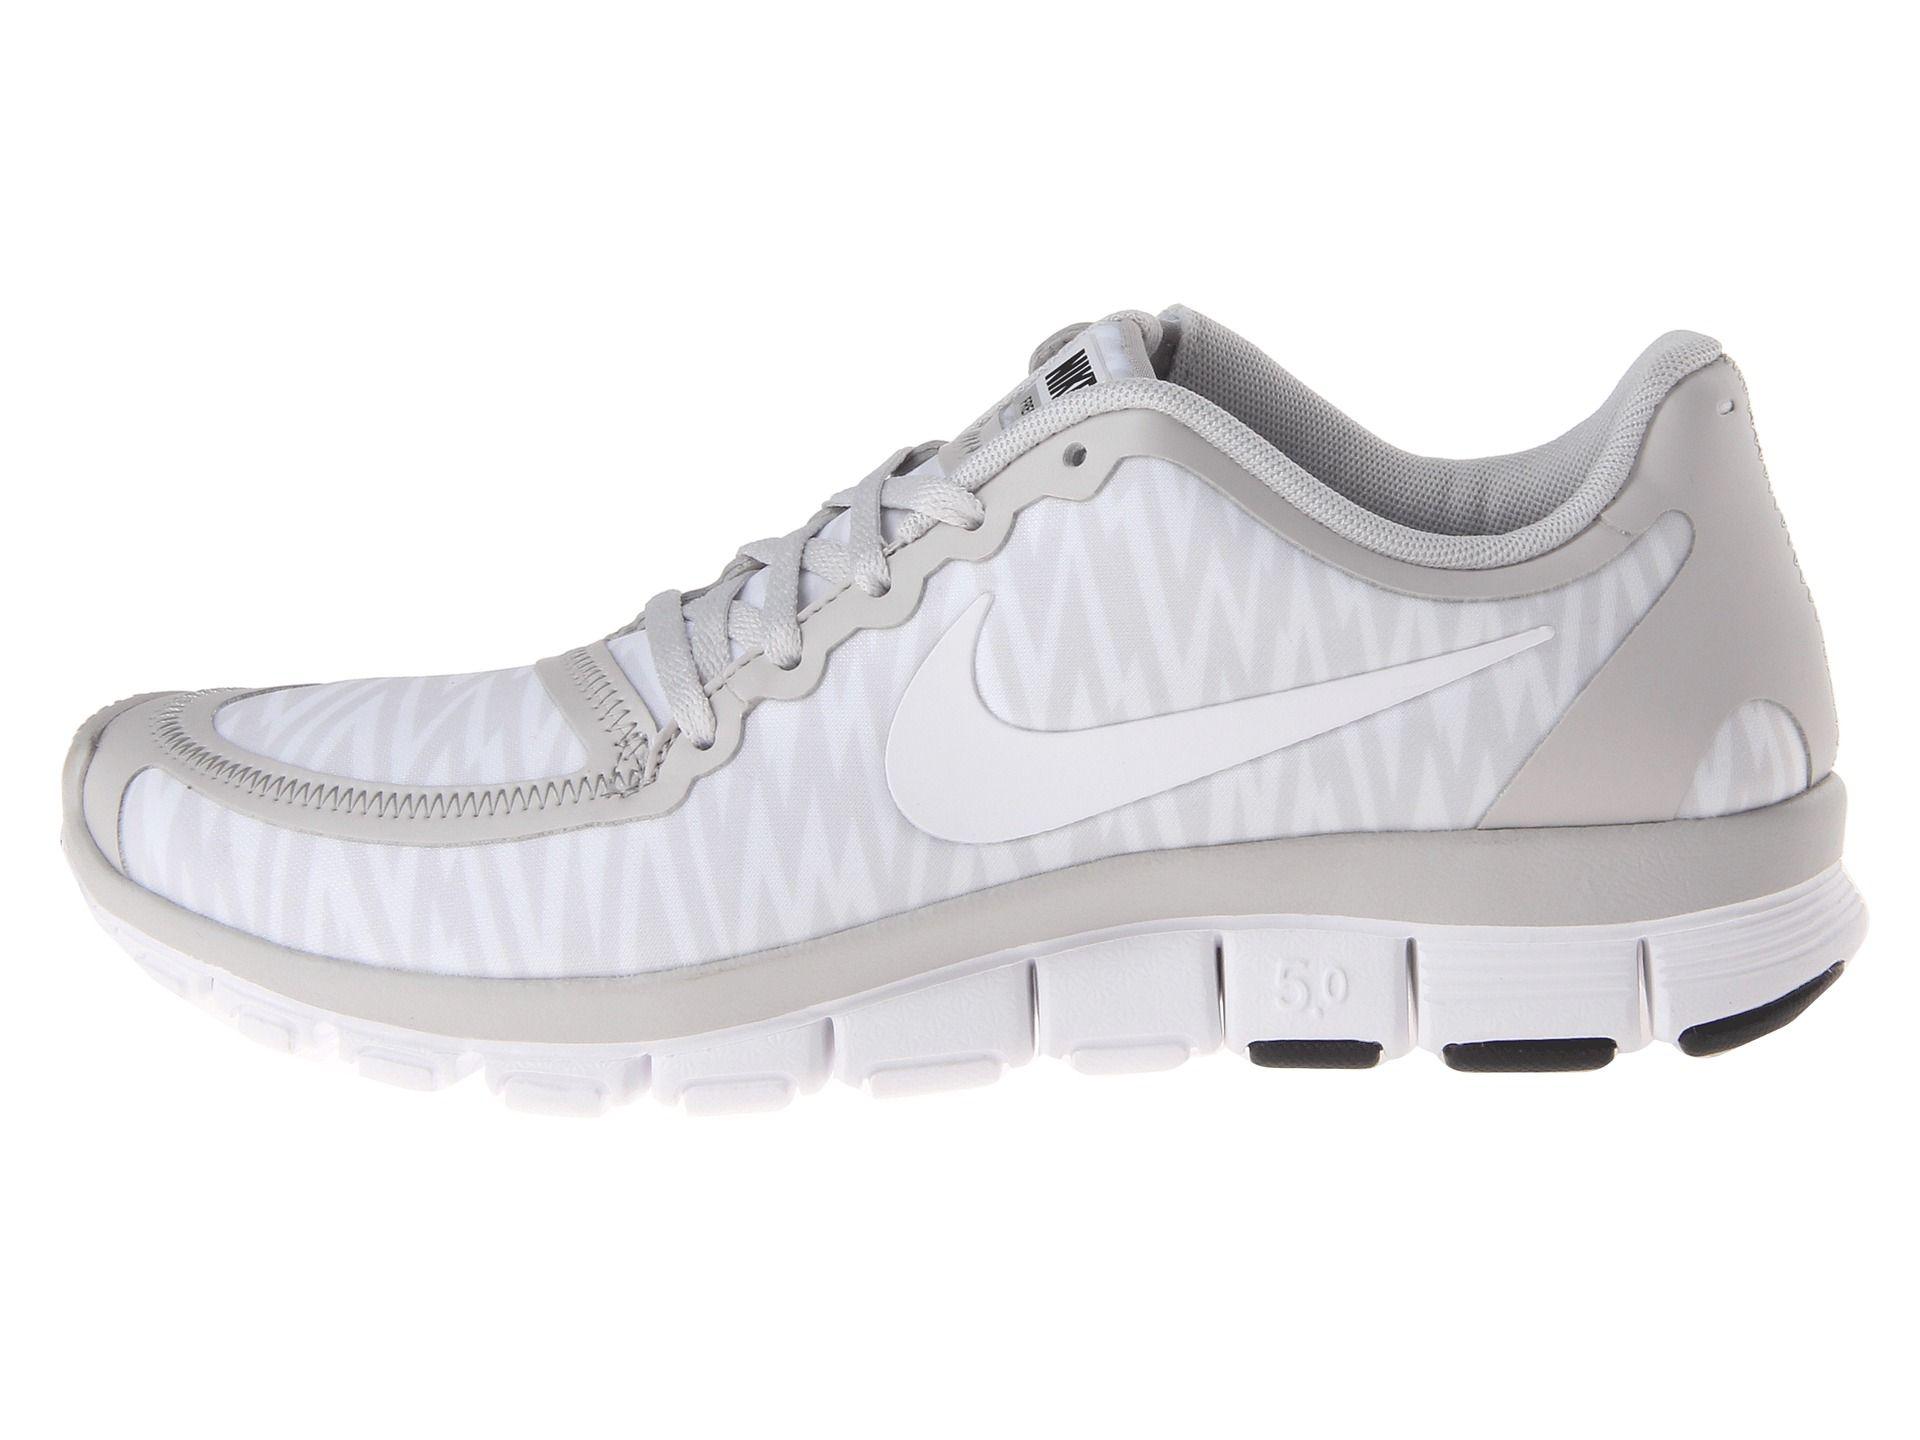 Womens Shoes Nike Free 5.0 V4 Neutral Grey/White/Anthracite/White